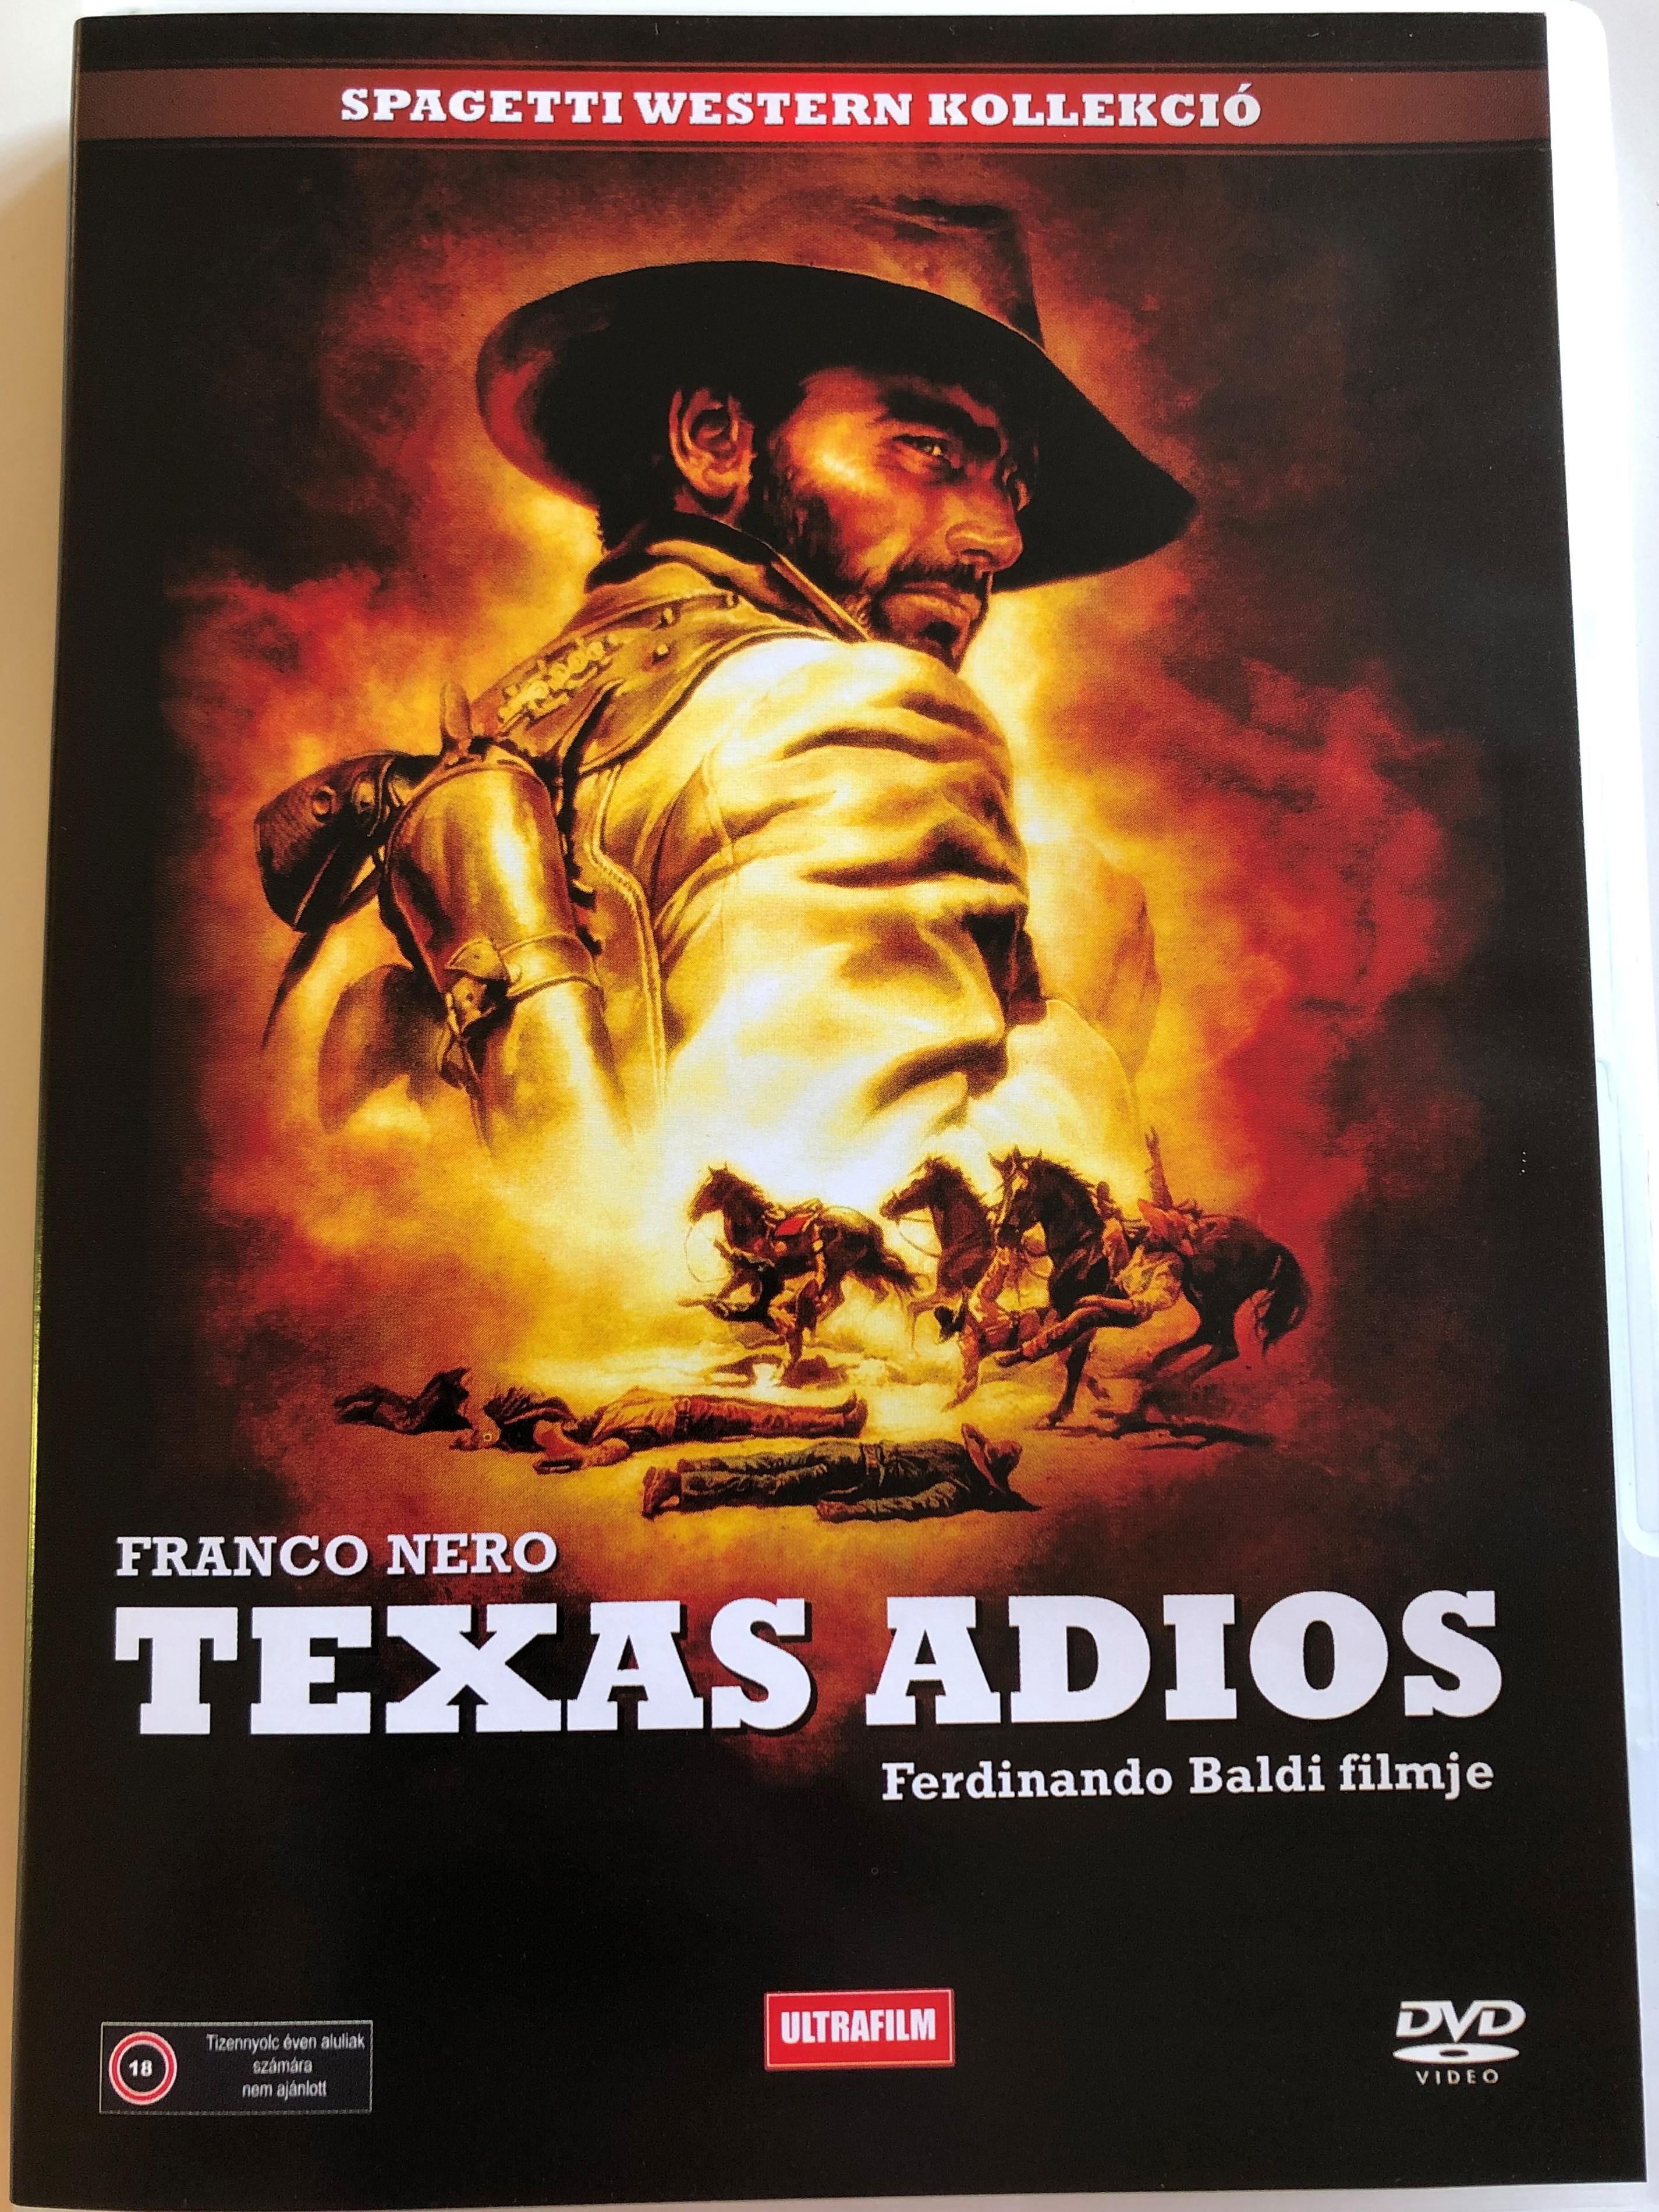 texas-adios-dvd-1966-texas-addio-directed-by-ferdinando-baldi-1.jpg